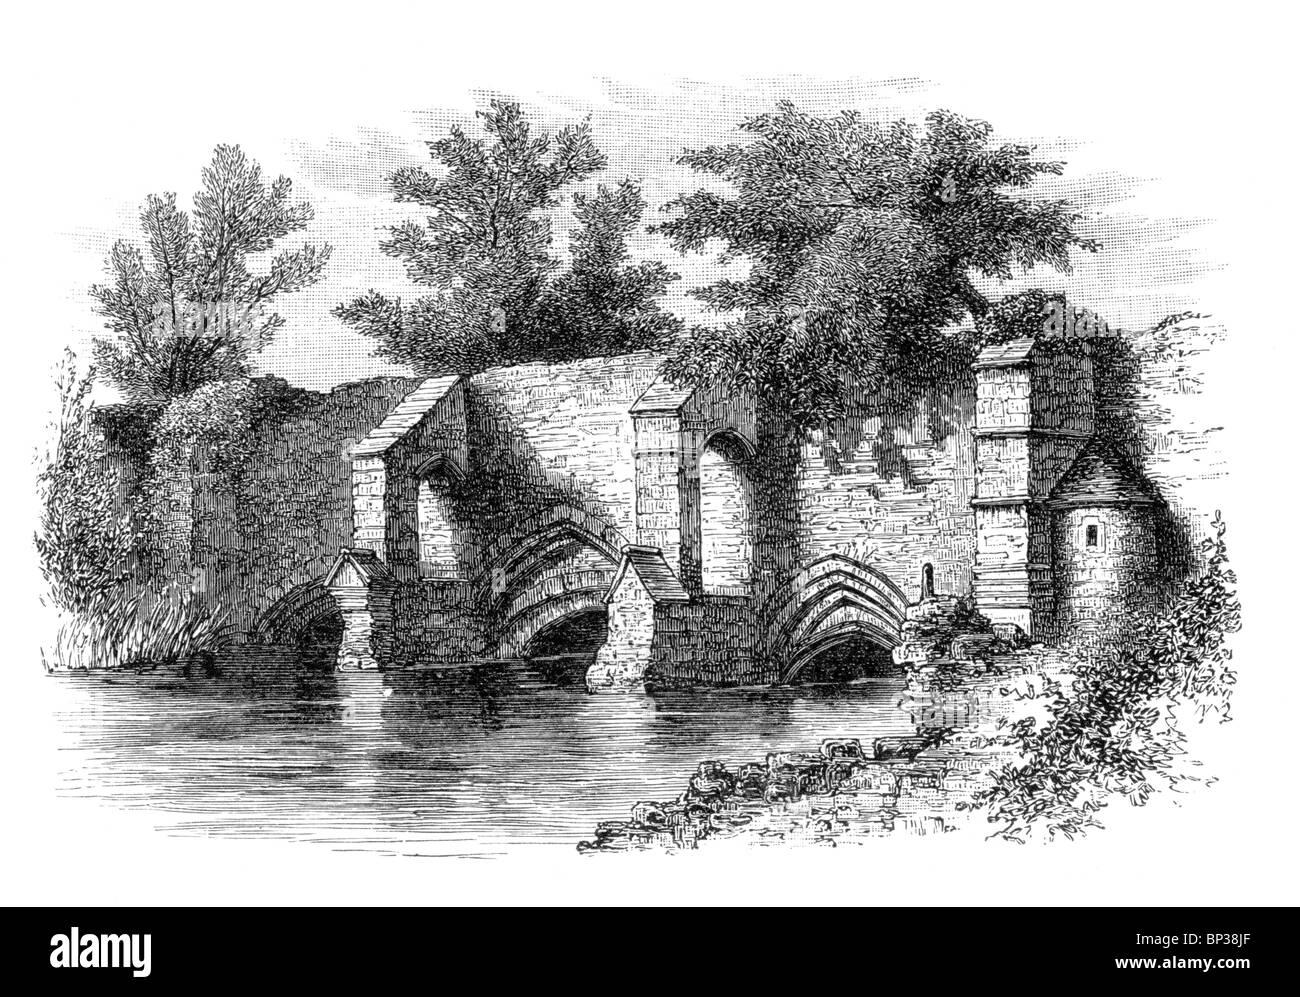 Black and White Illustration; Abbot's Bridge, Bury St Edmunds; 13th century; - Stock Image